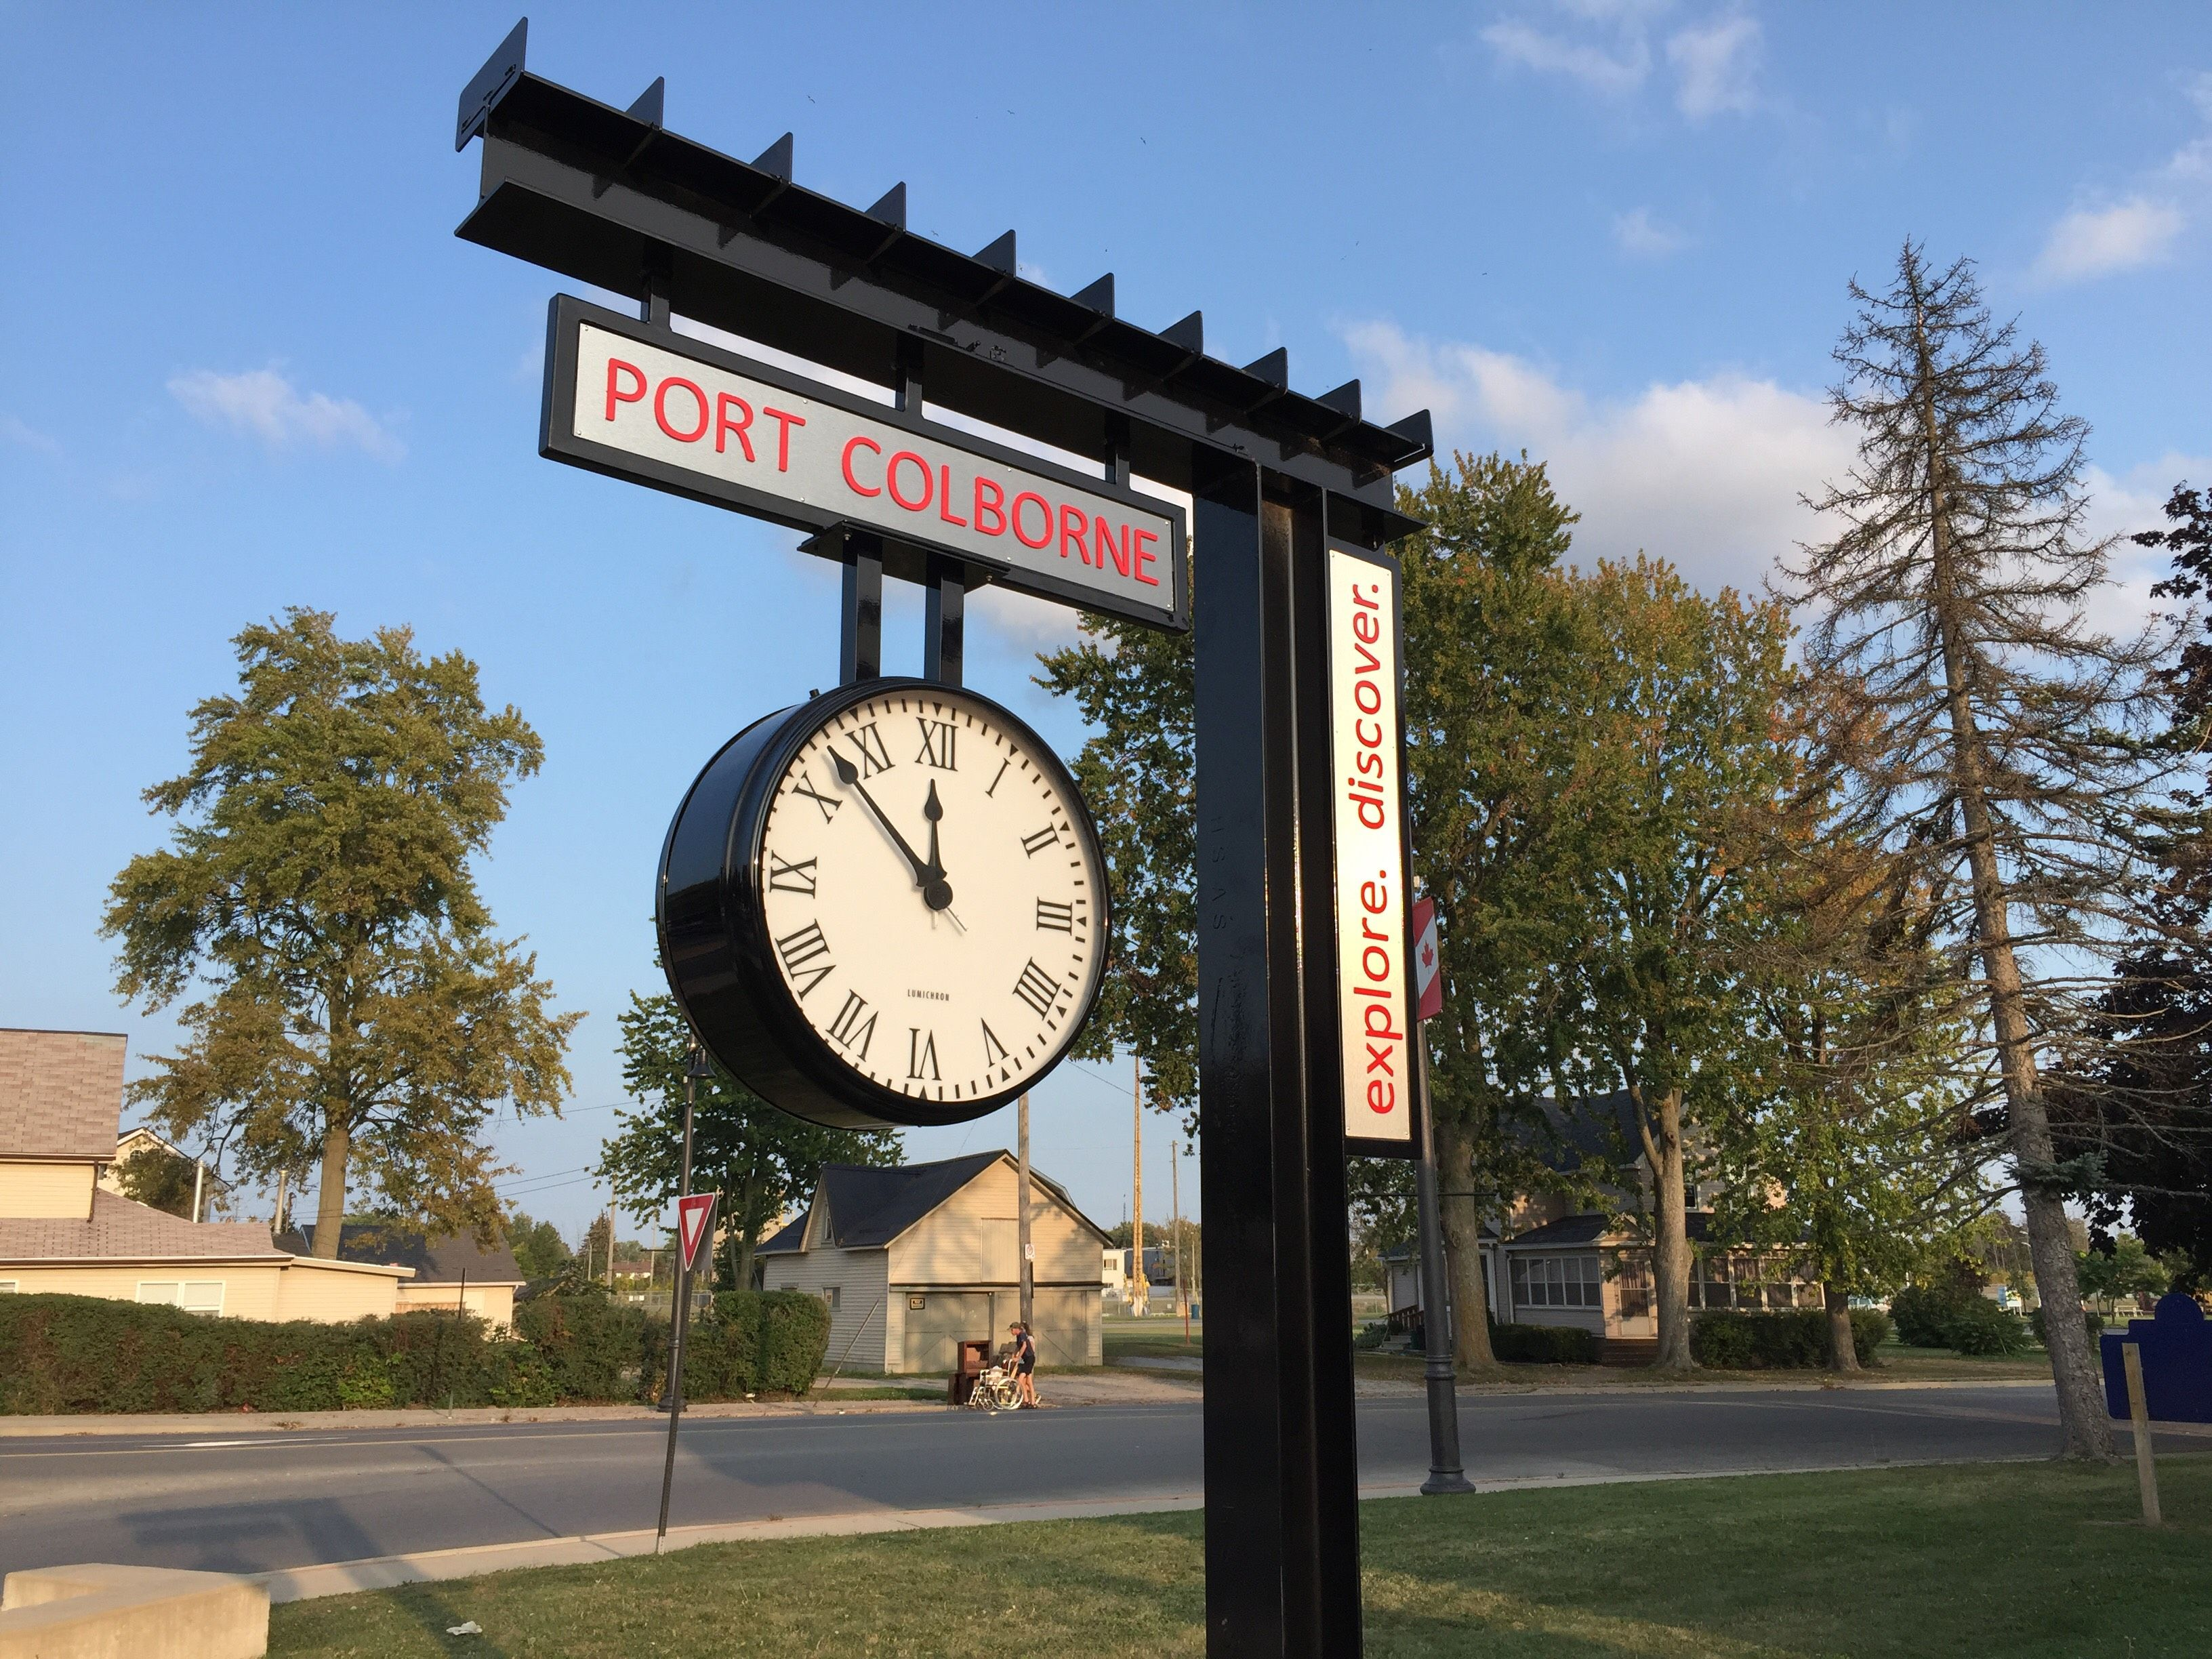 Port Colborne, Ontario, Canada Train Station Clock by